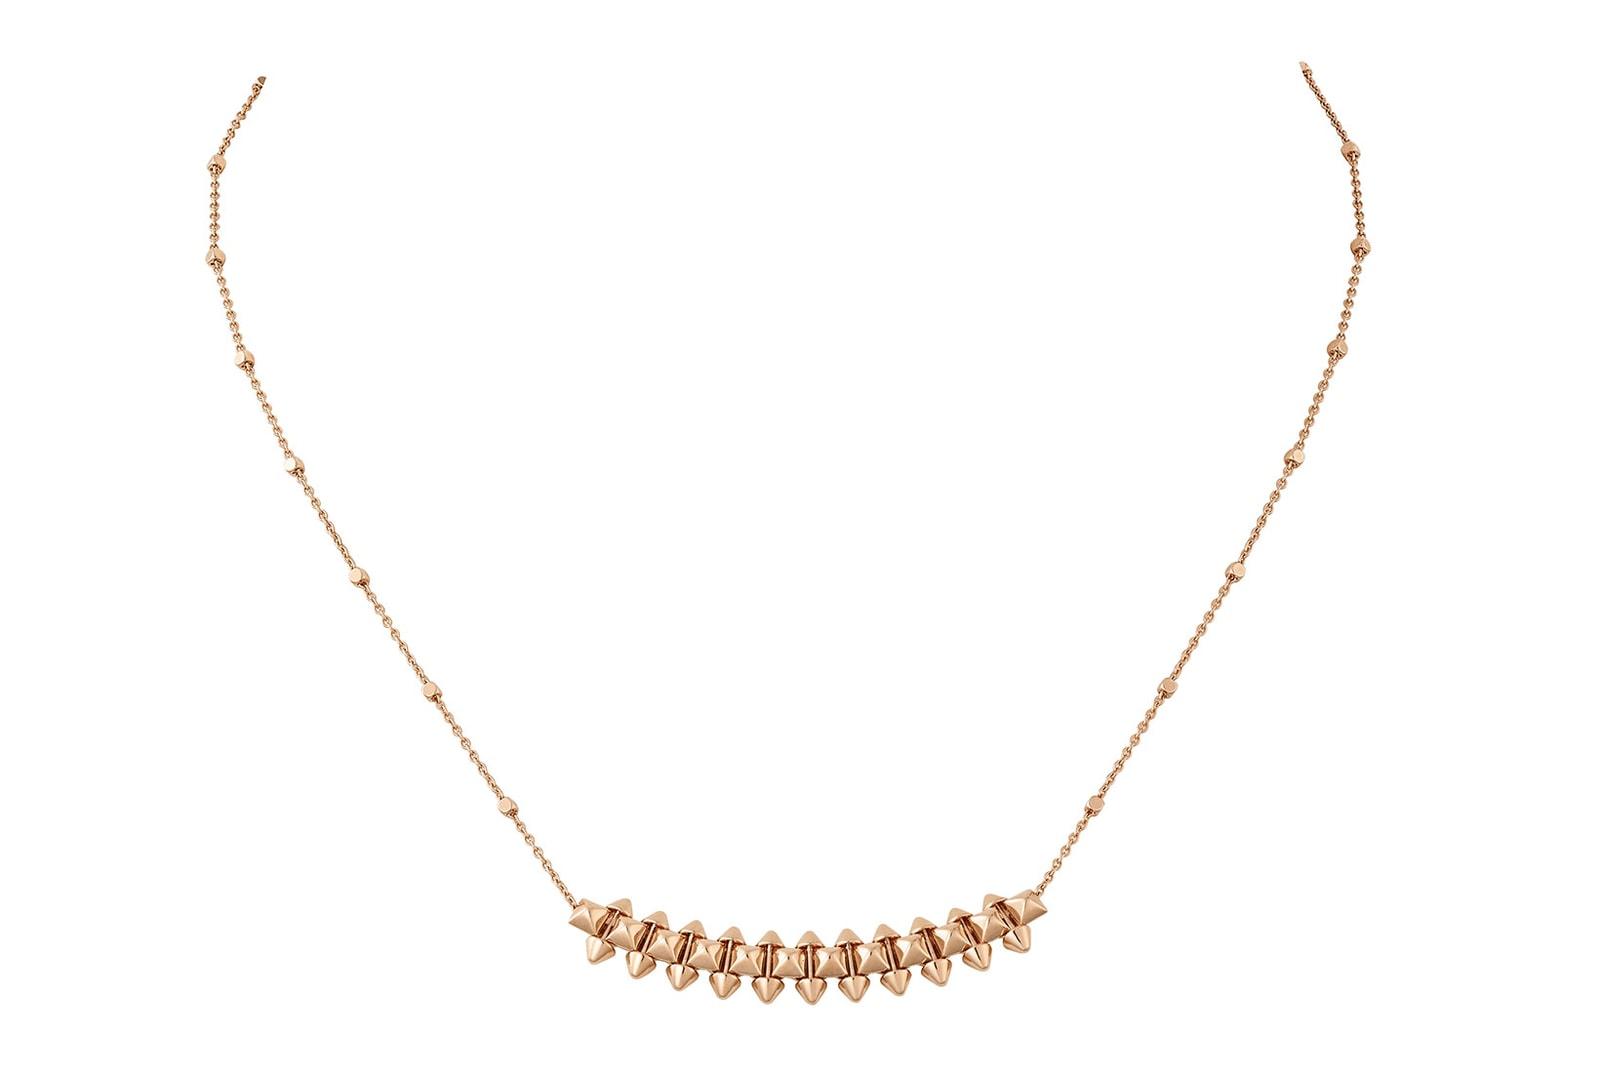 clash de cartier gold pink white gold diamonds jewelry launch kaya scodelario necklaces earrings bracelets